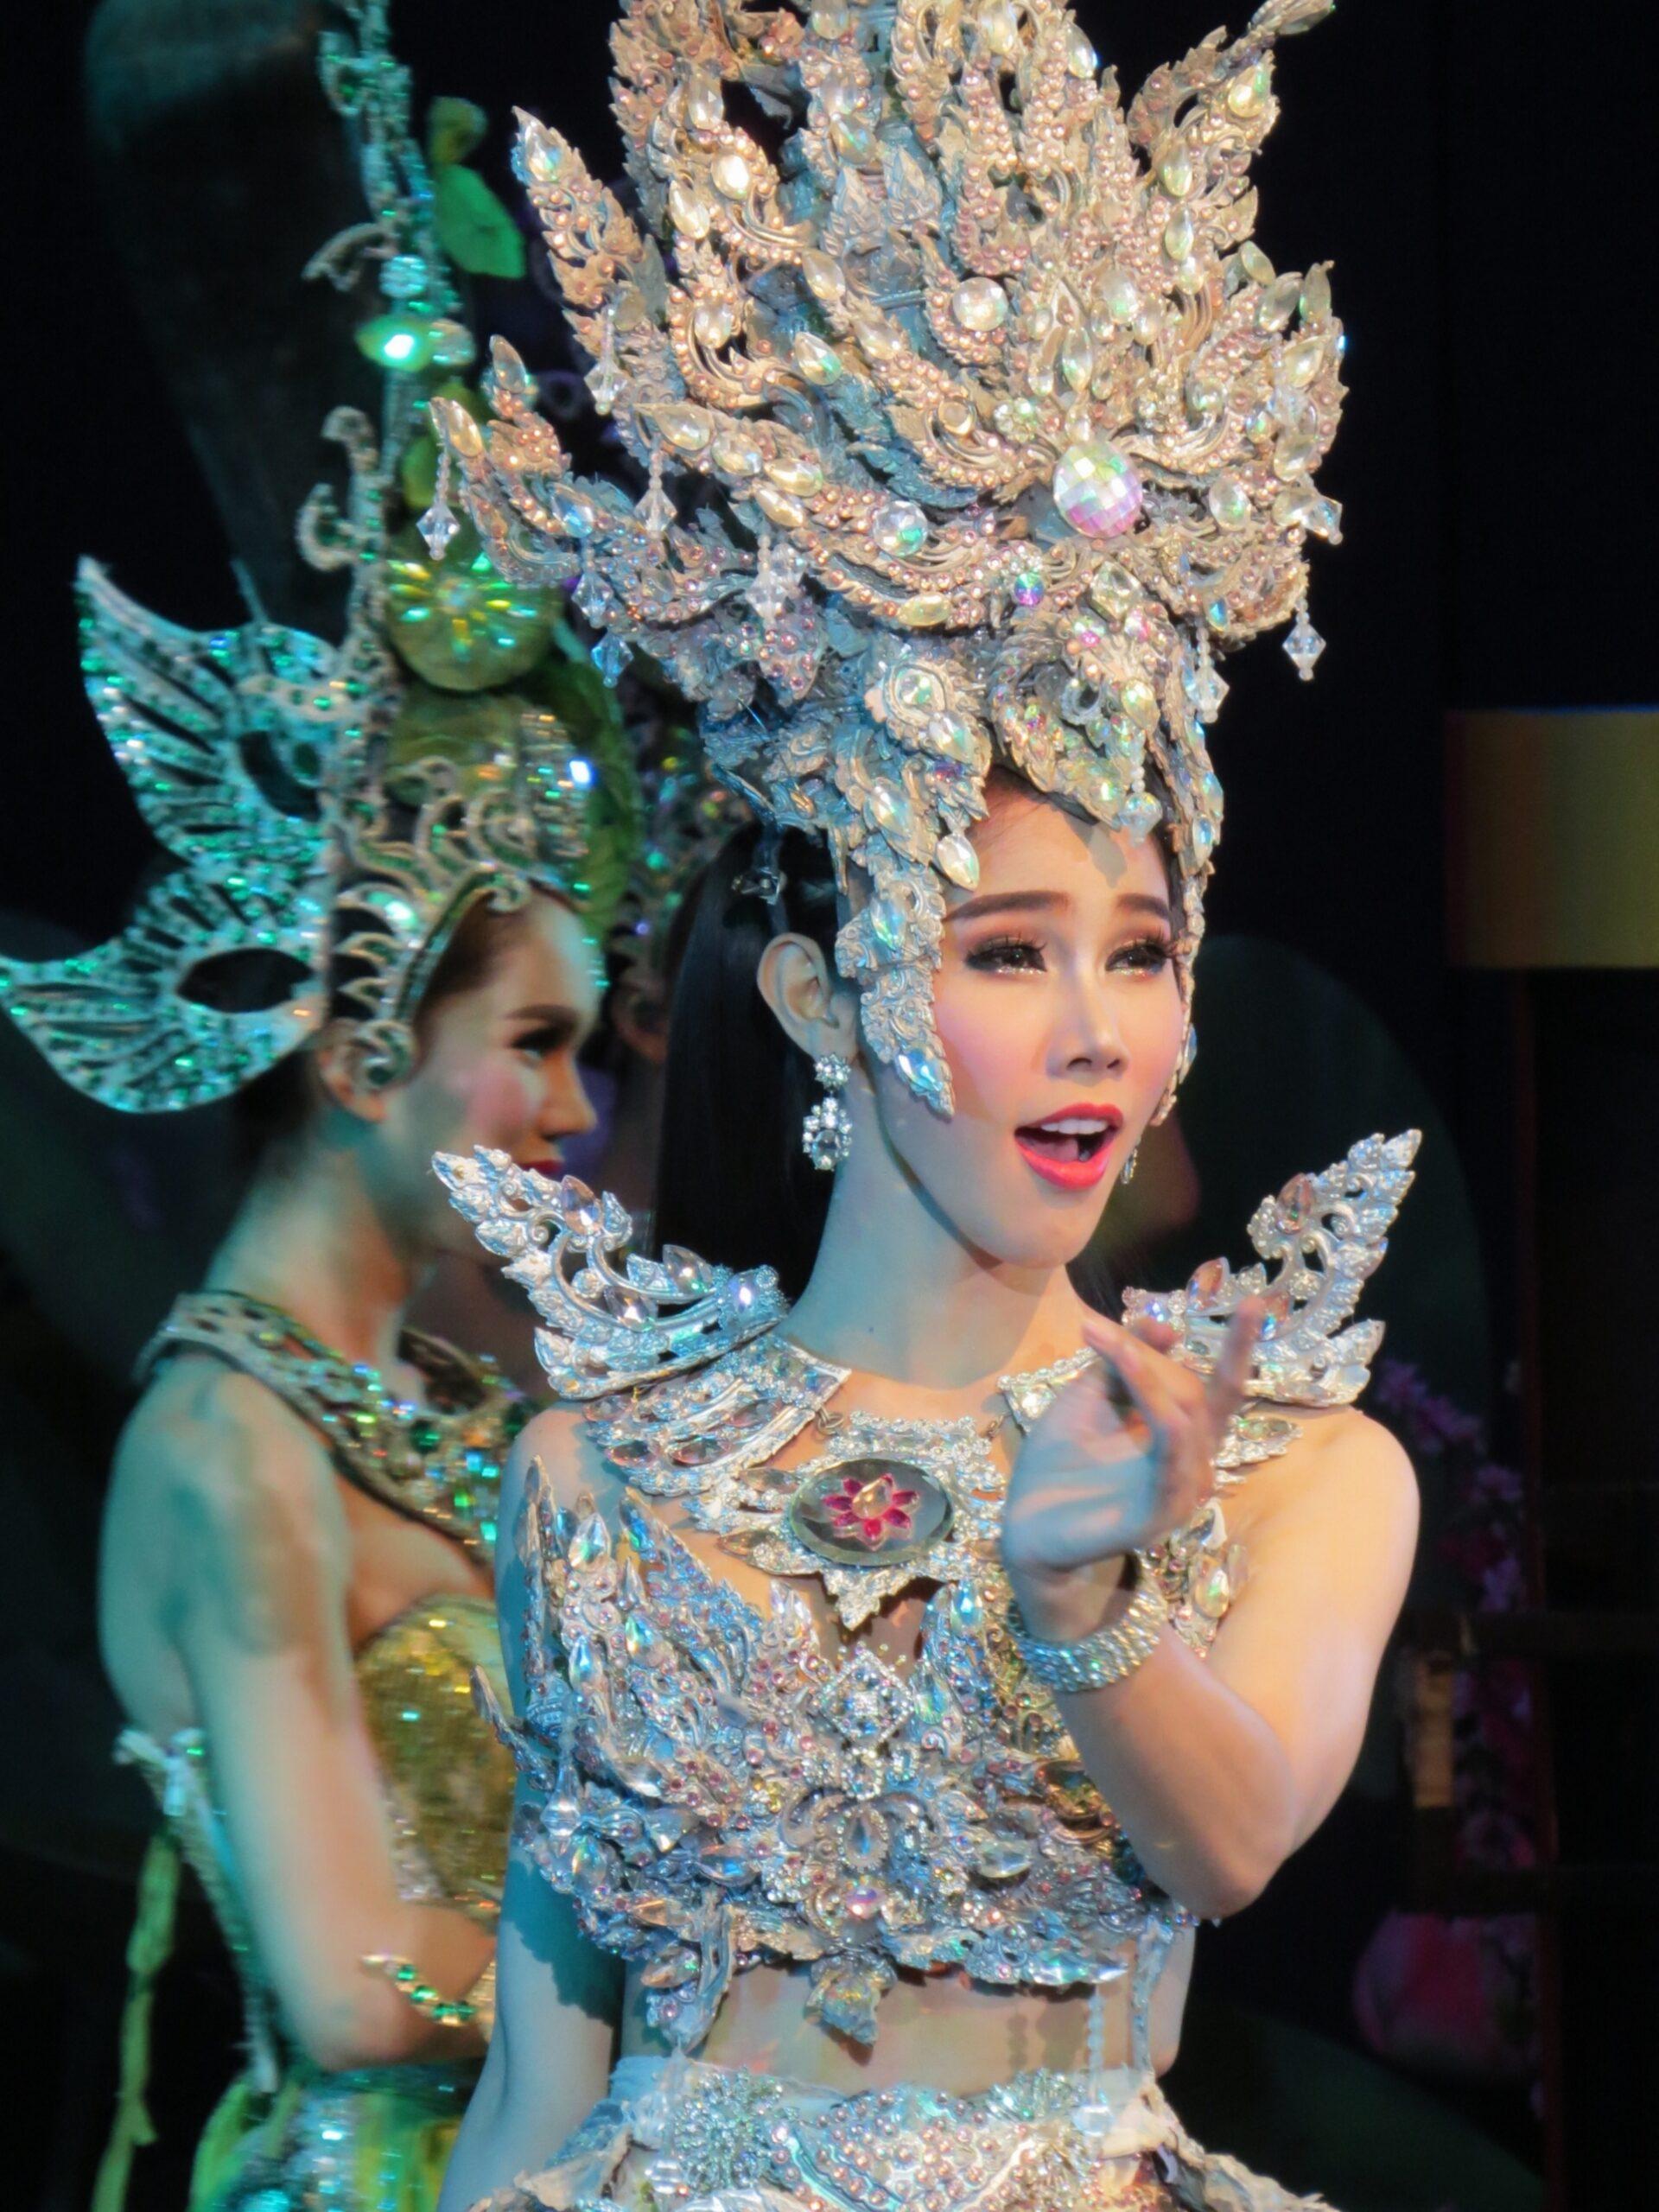 Тайланд тиффани шоу шоу трансвеститов моему